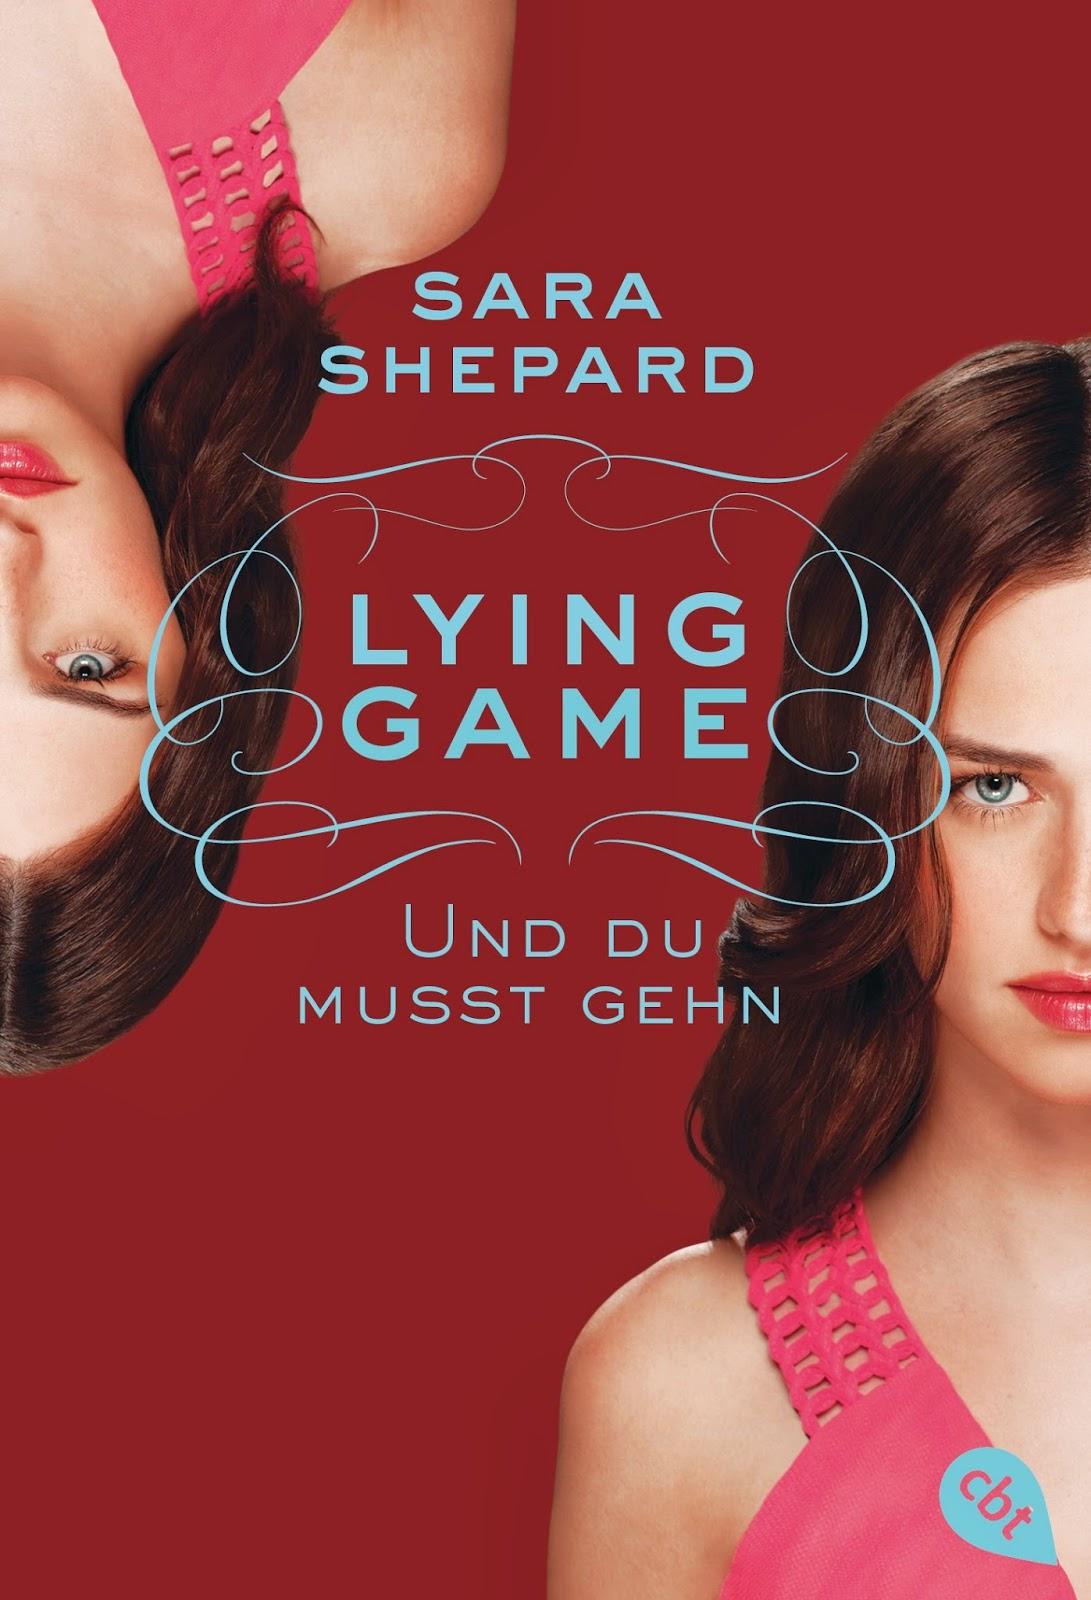 http://www.randomhouse.de/Taschenbuch/Lying-Game-Und-du-musst-gehn-Band-6/Sara-Shepard/e450076.rhd